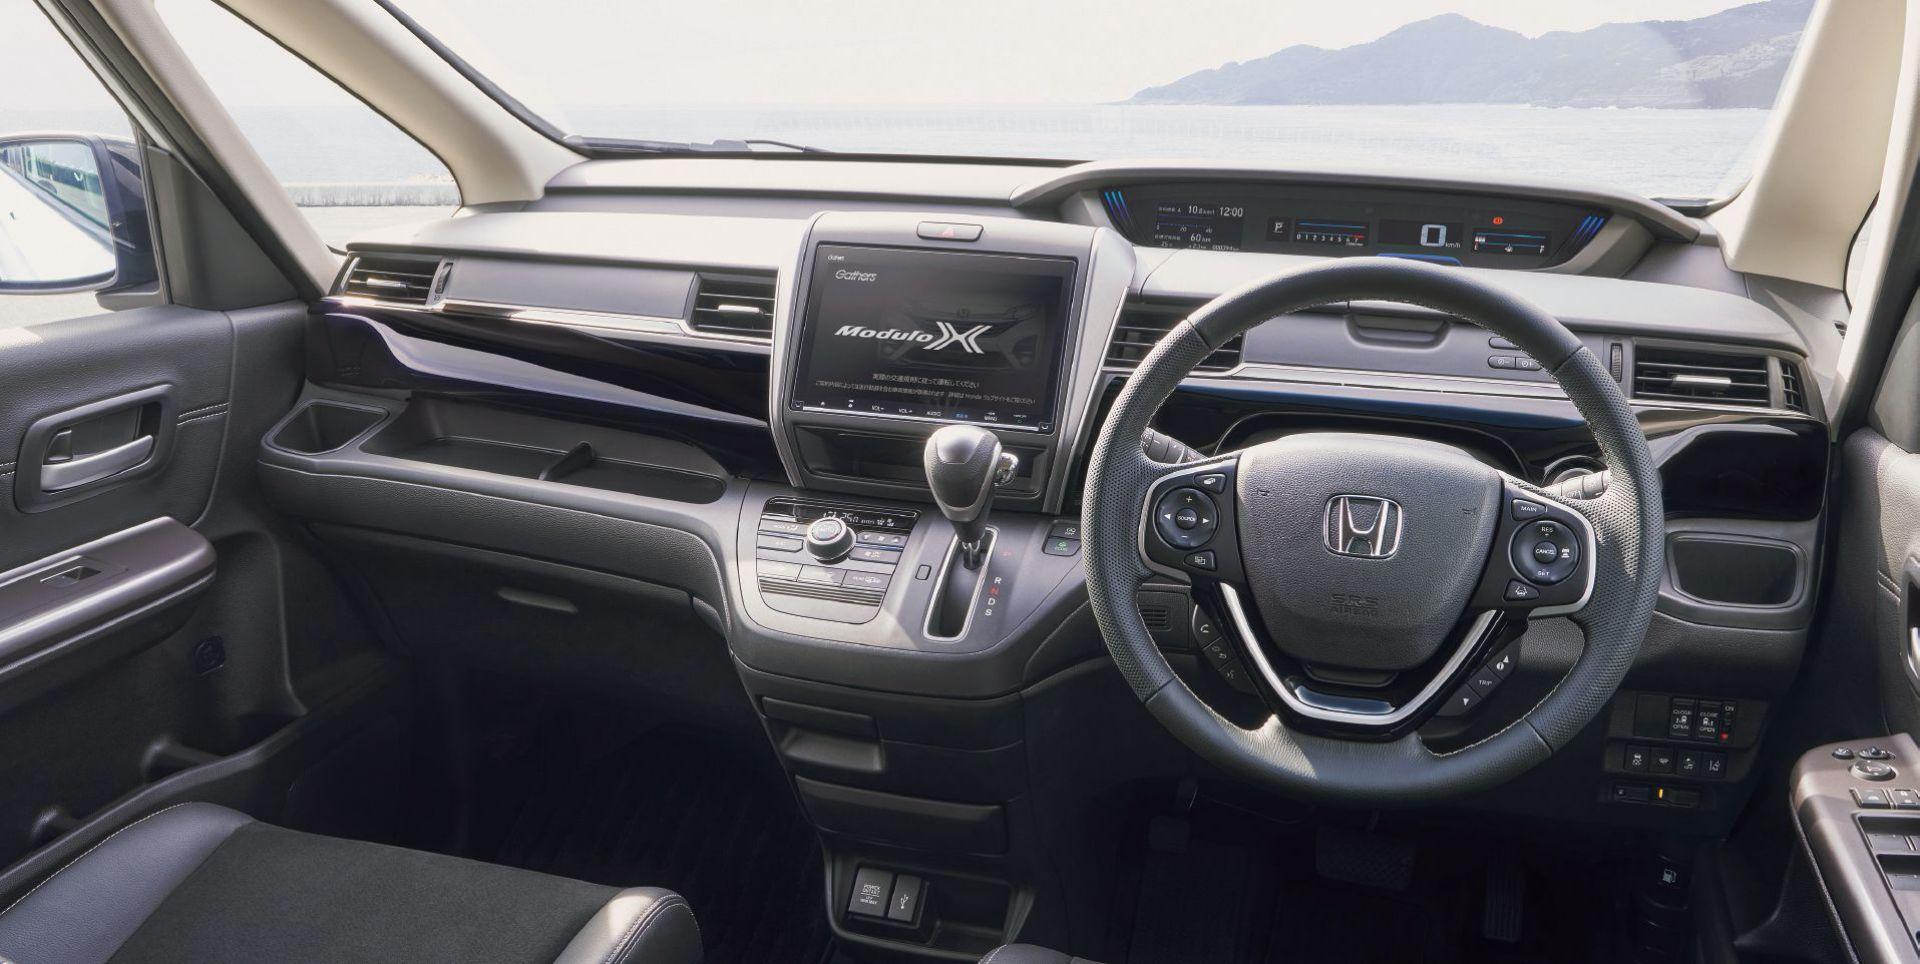 Honda-Freed-Modulo-X-Facelift-2020-42